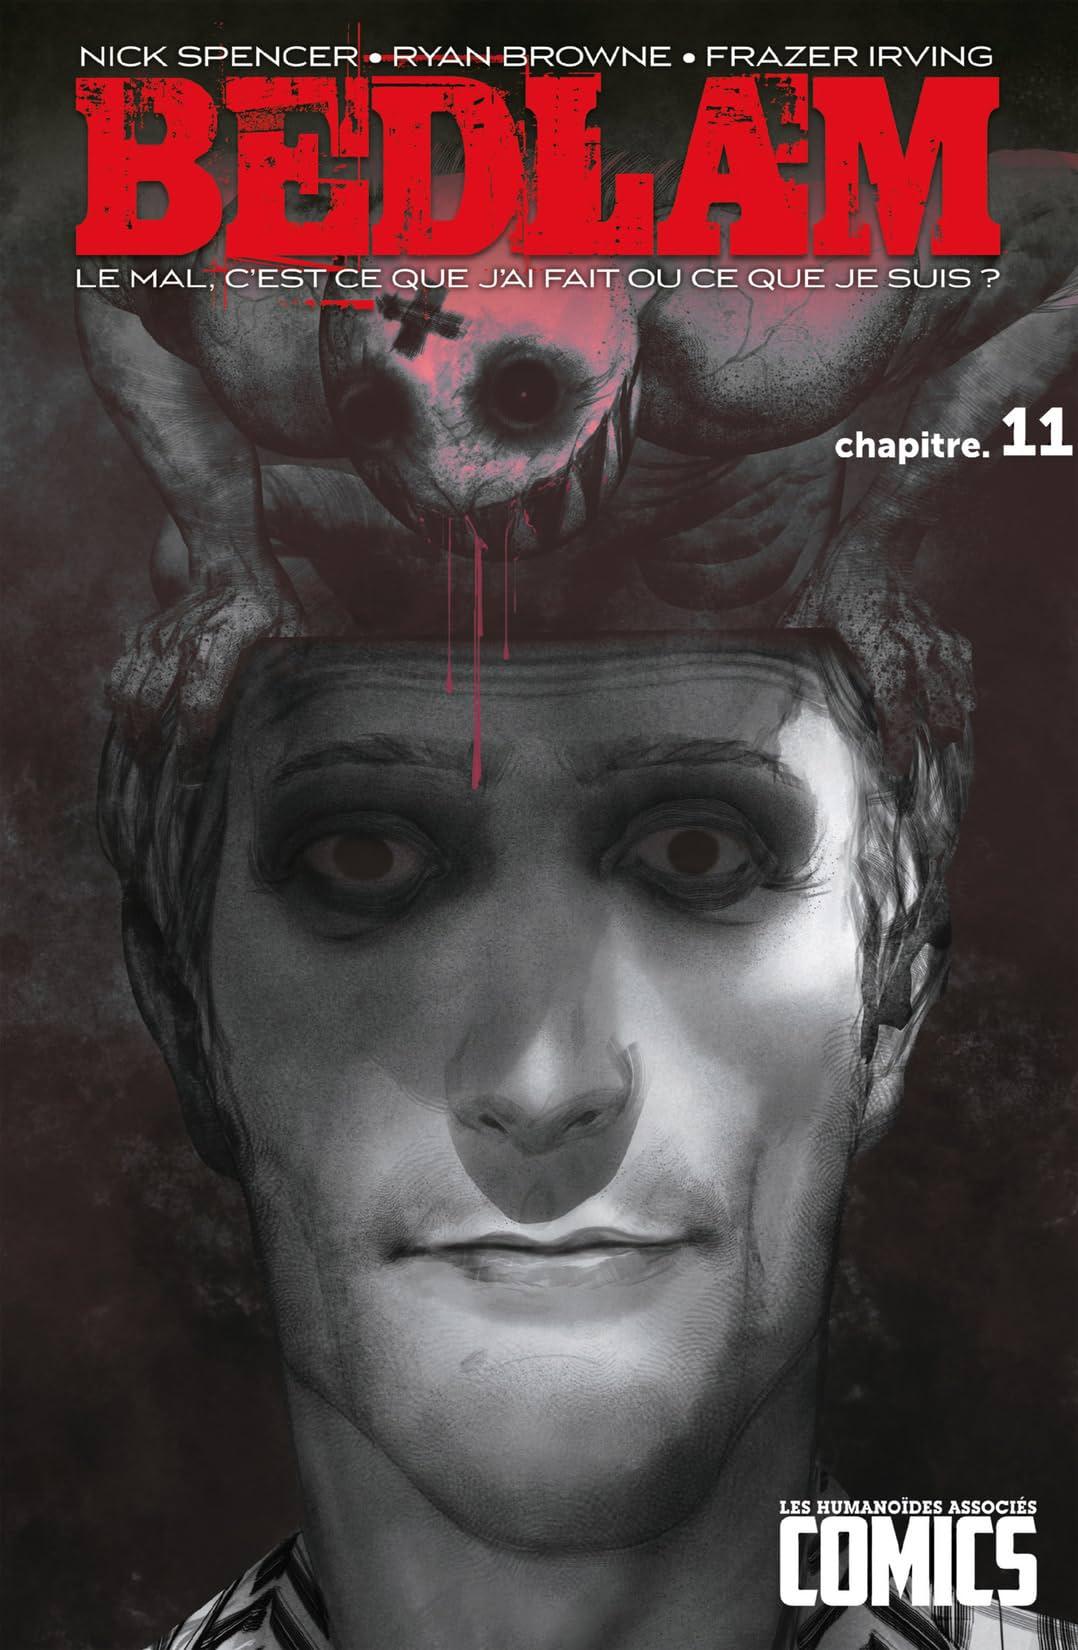 Bedlam: Chapitre 11